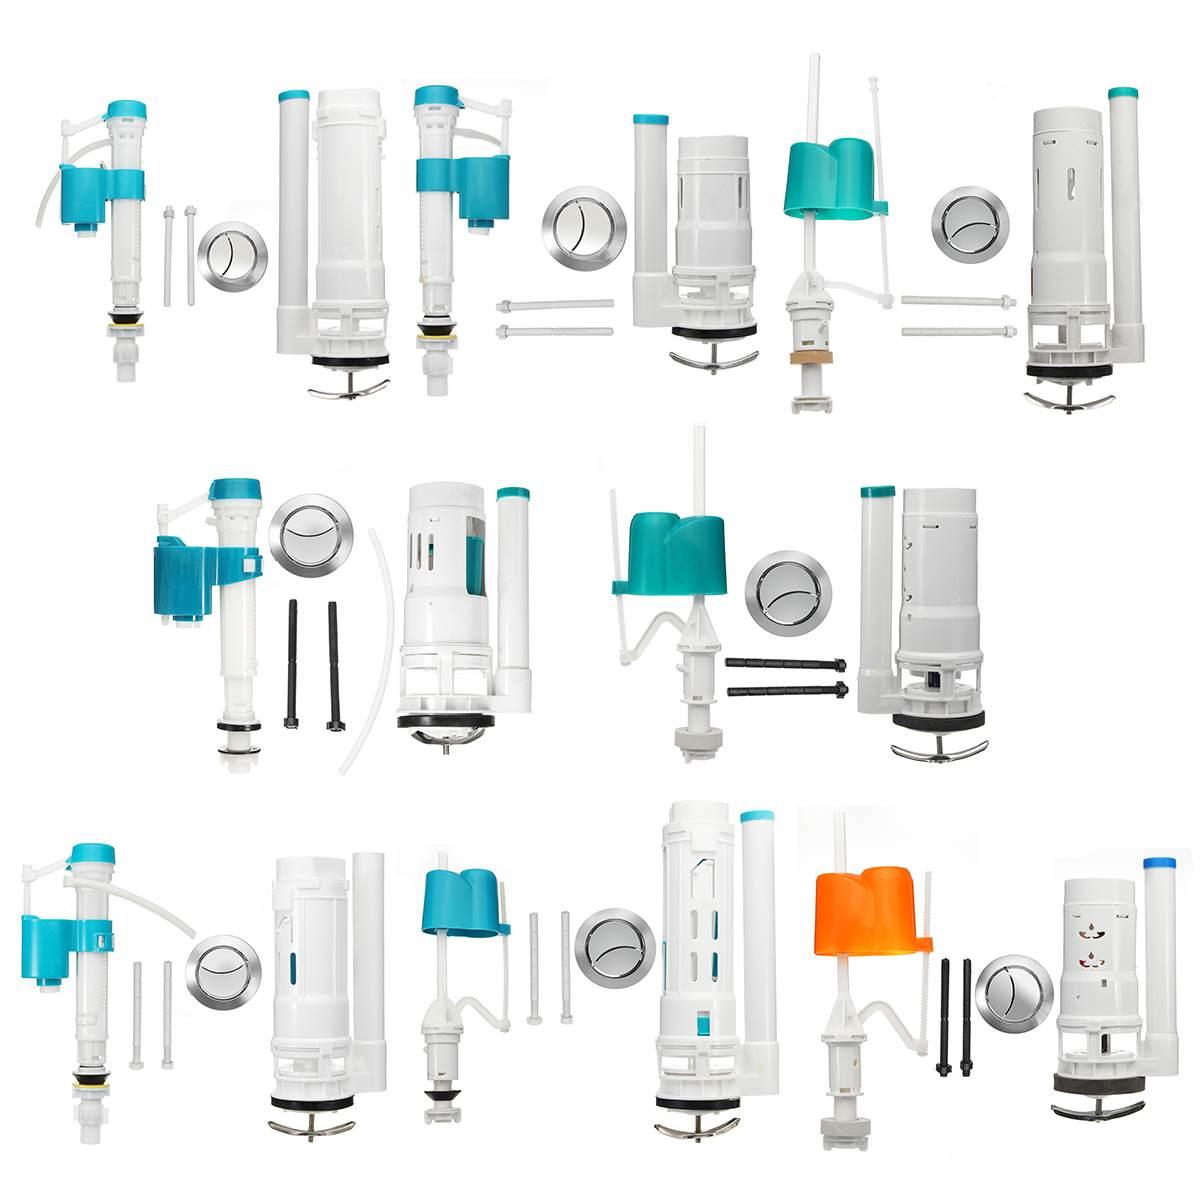 Válvula de botón de inodoro juego doble sifón cisterna sifón entrada inferior para cisterna Reparación de inodoro baño herramienta de tocador 8 tipos